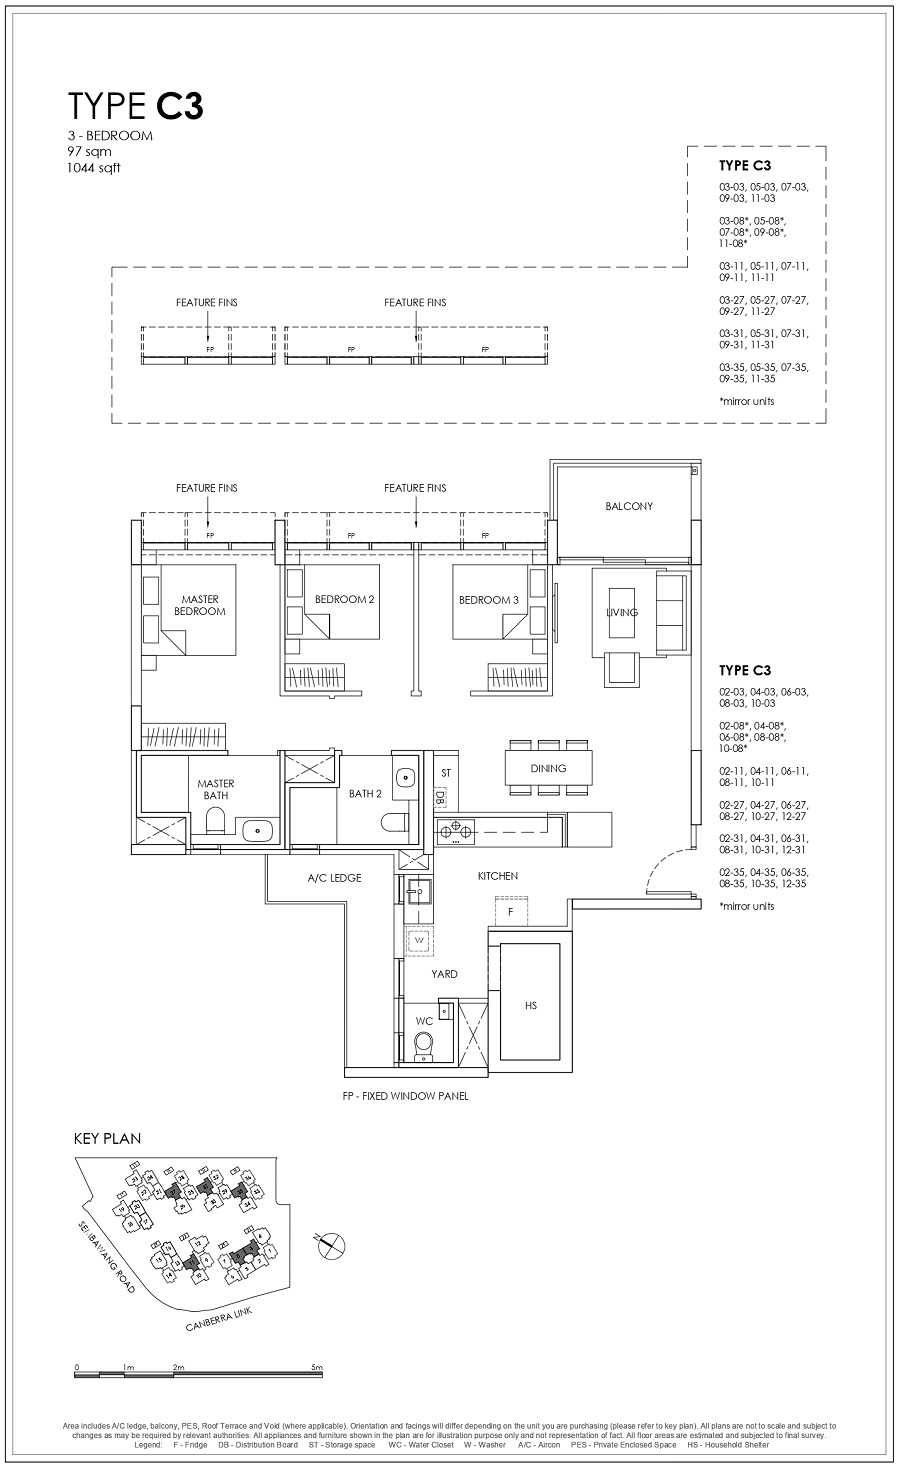 Provence Residence EC 3BR Type C3 97_1044